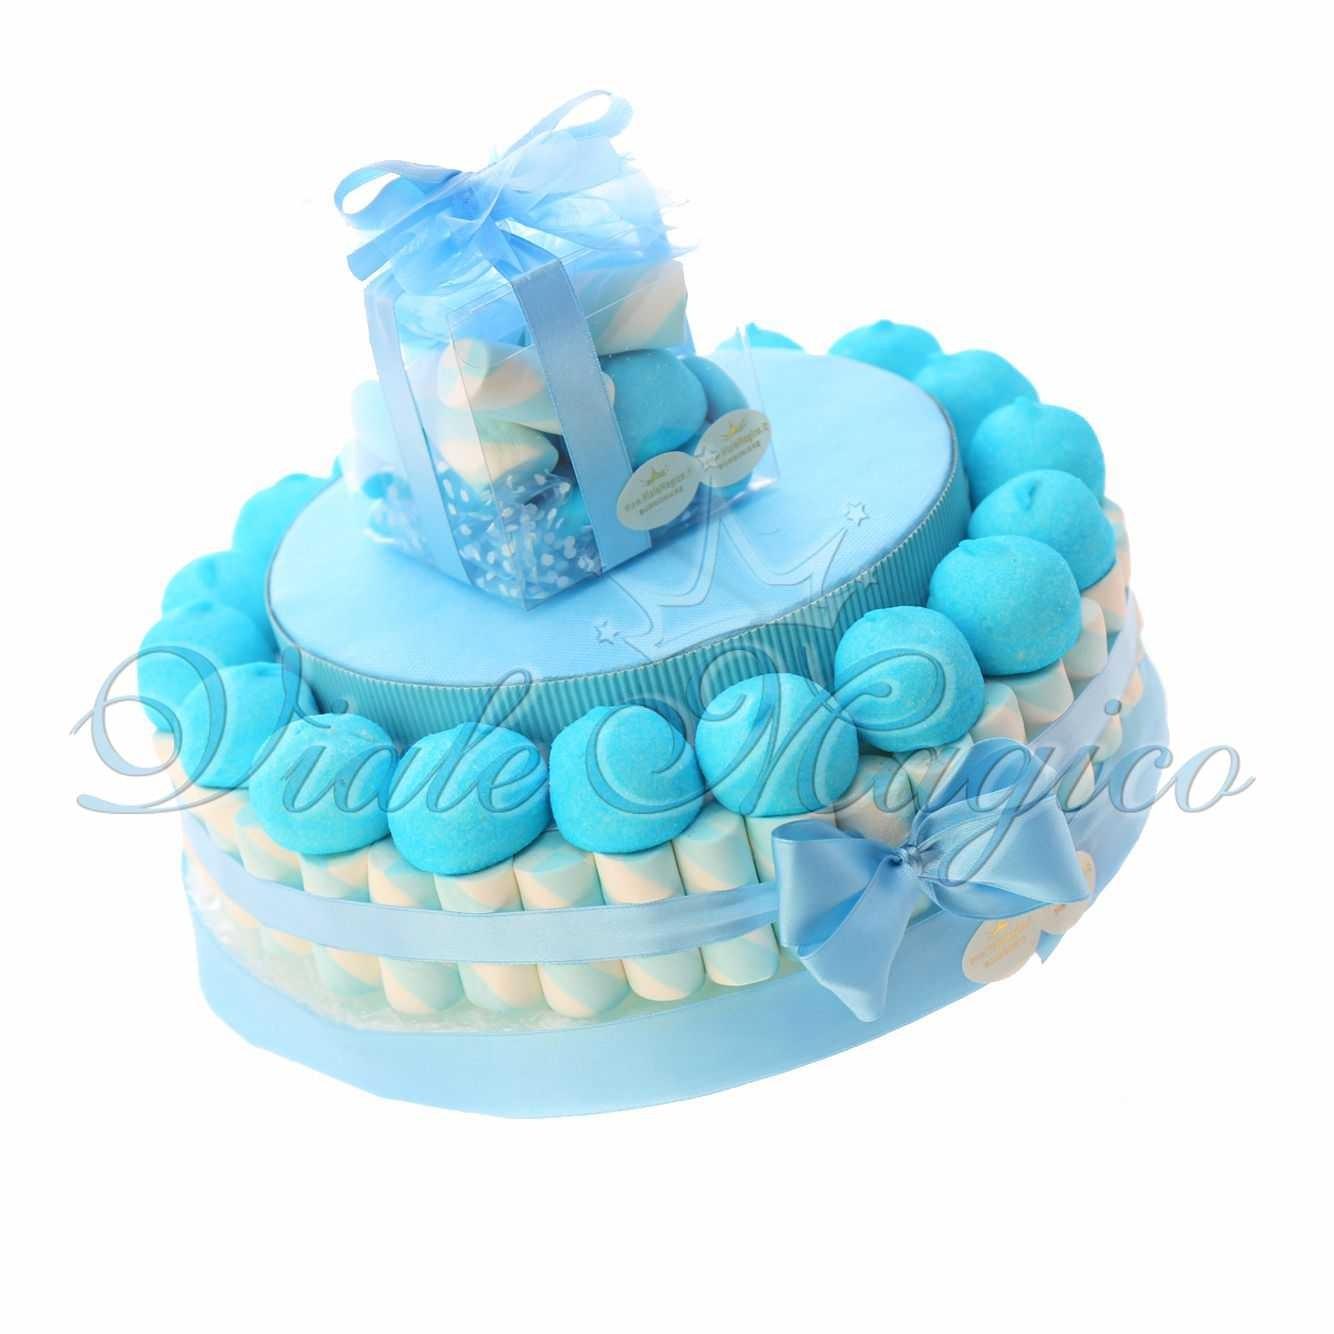 Amato Torte Marshmallow Caramelle Nascita Compleanno Bimbo Confettata  AF53